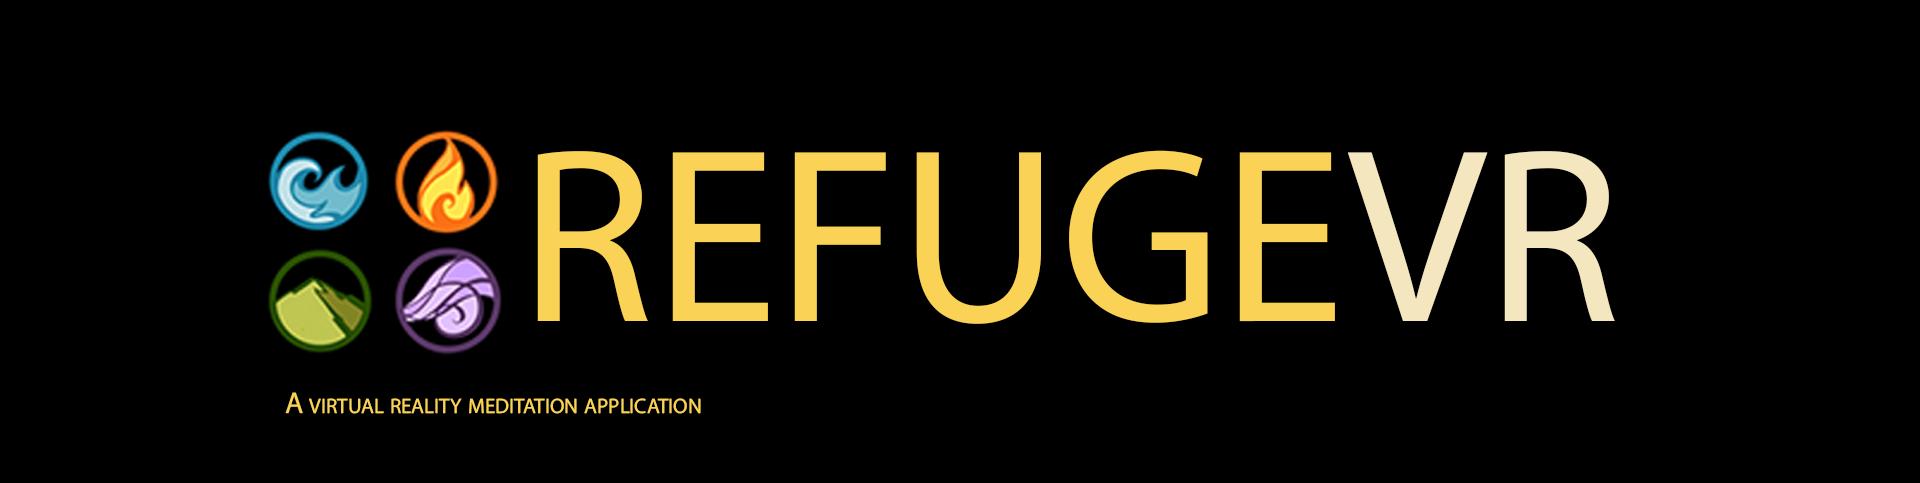 RefugeVR: Virtual reality meditation